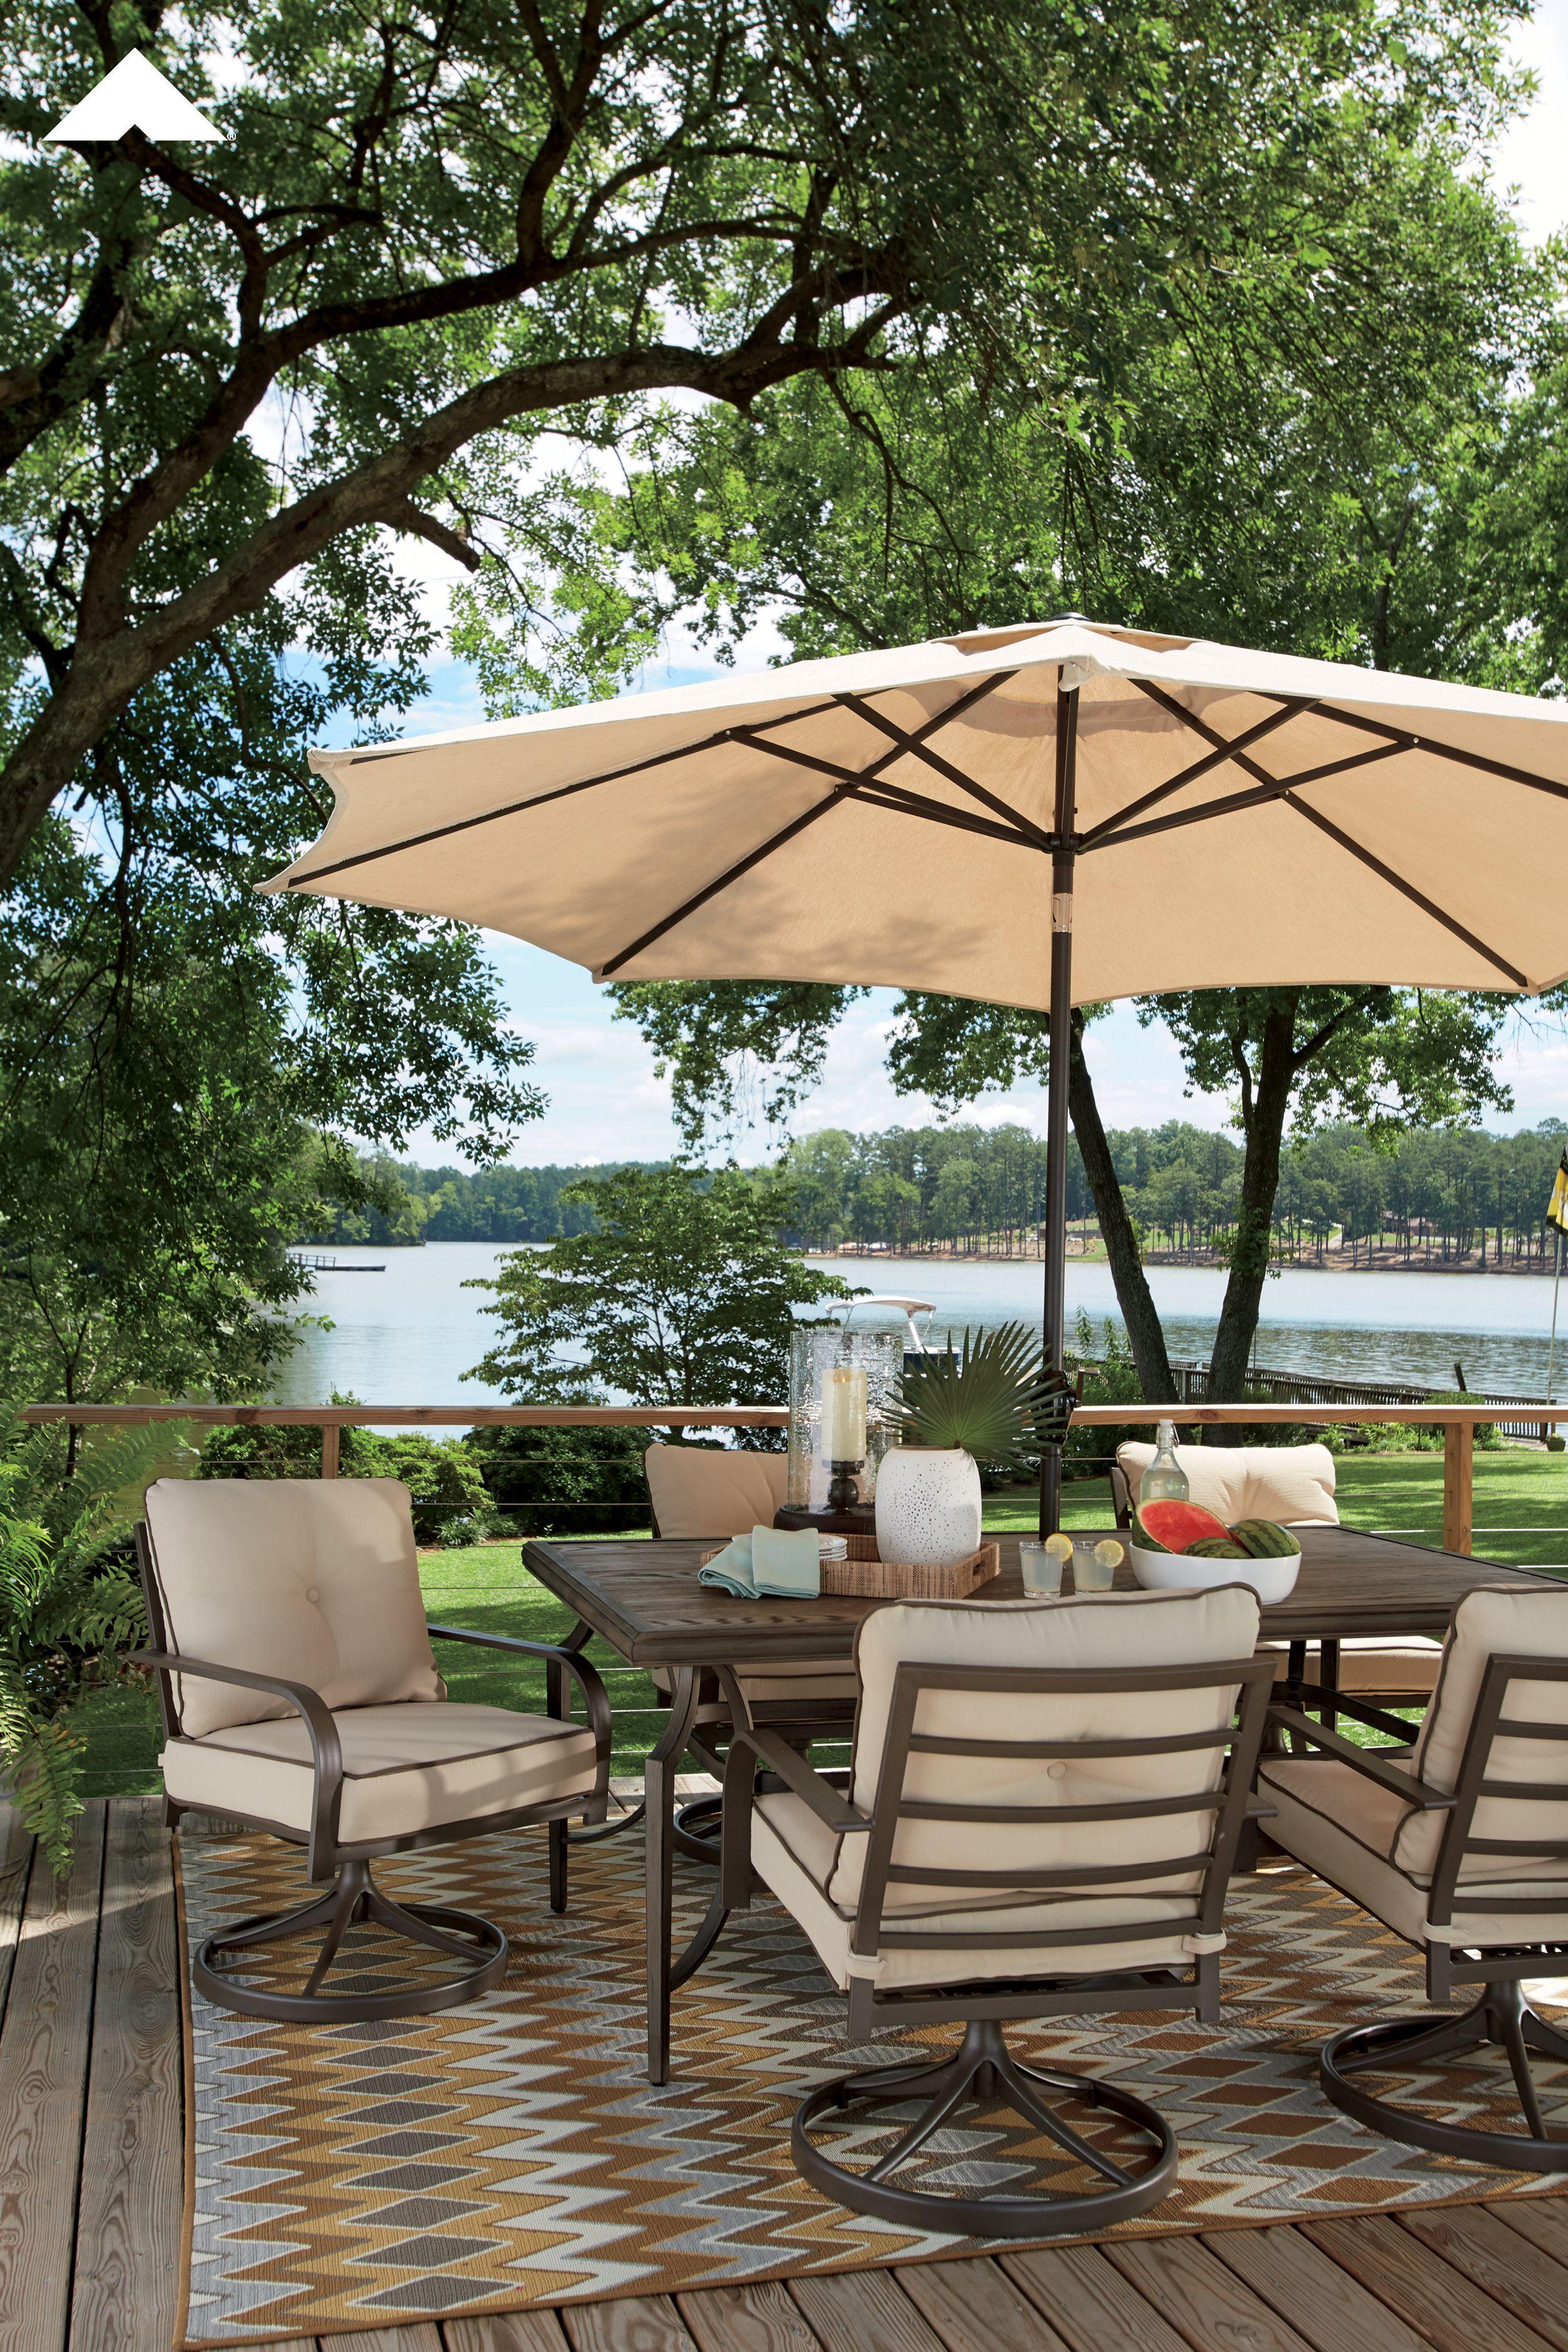 Predmore Brown Rectangular Dining Table By Ashley Furniture. |  #AshleyFurniture #Outdoorfurniture #Dining